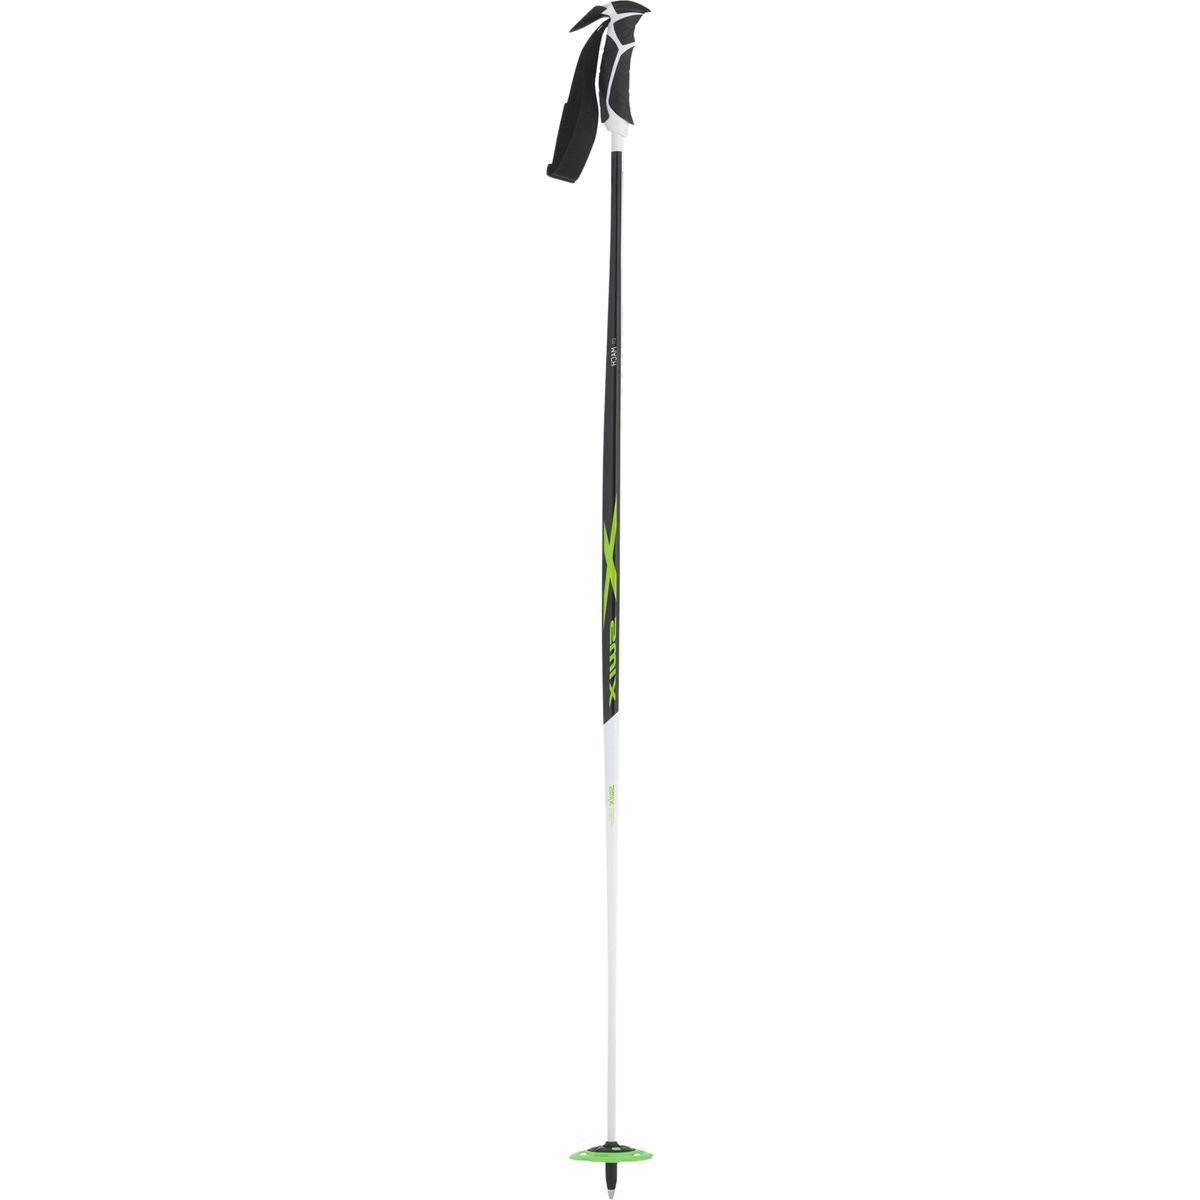 Swix Mach II IPM Carbon Composite Ski Pole